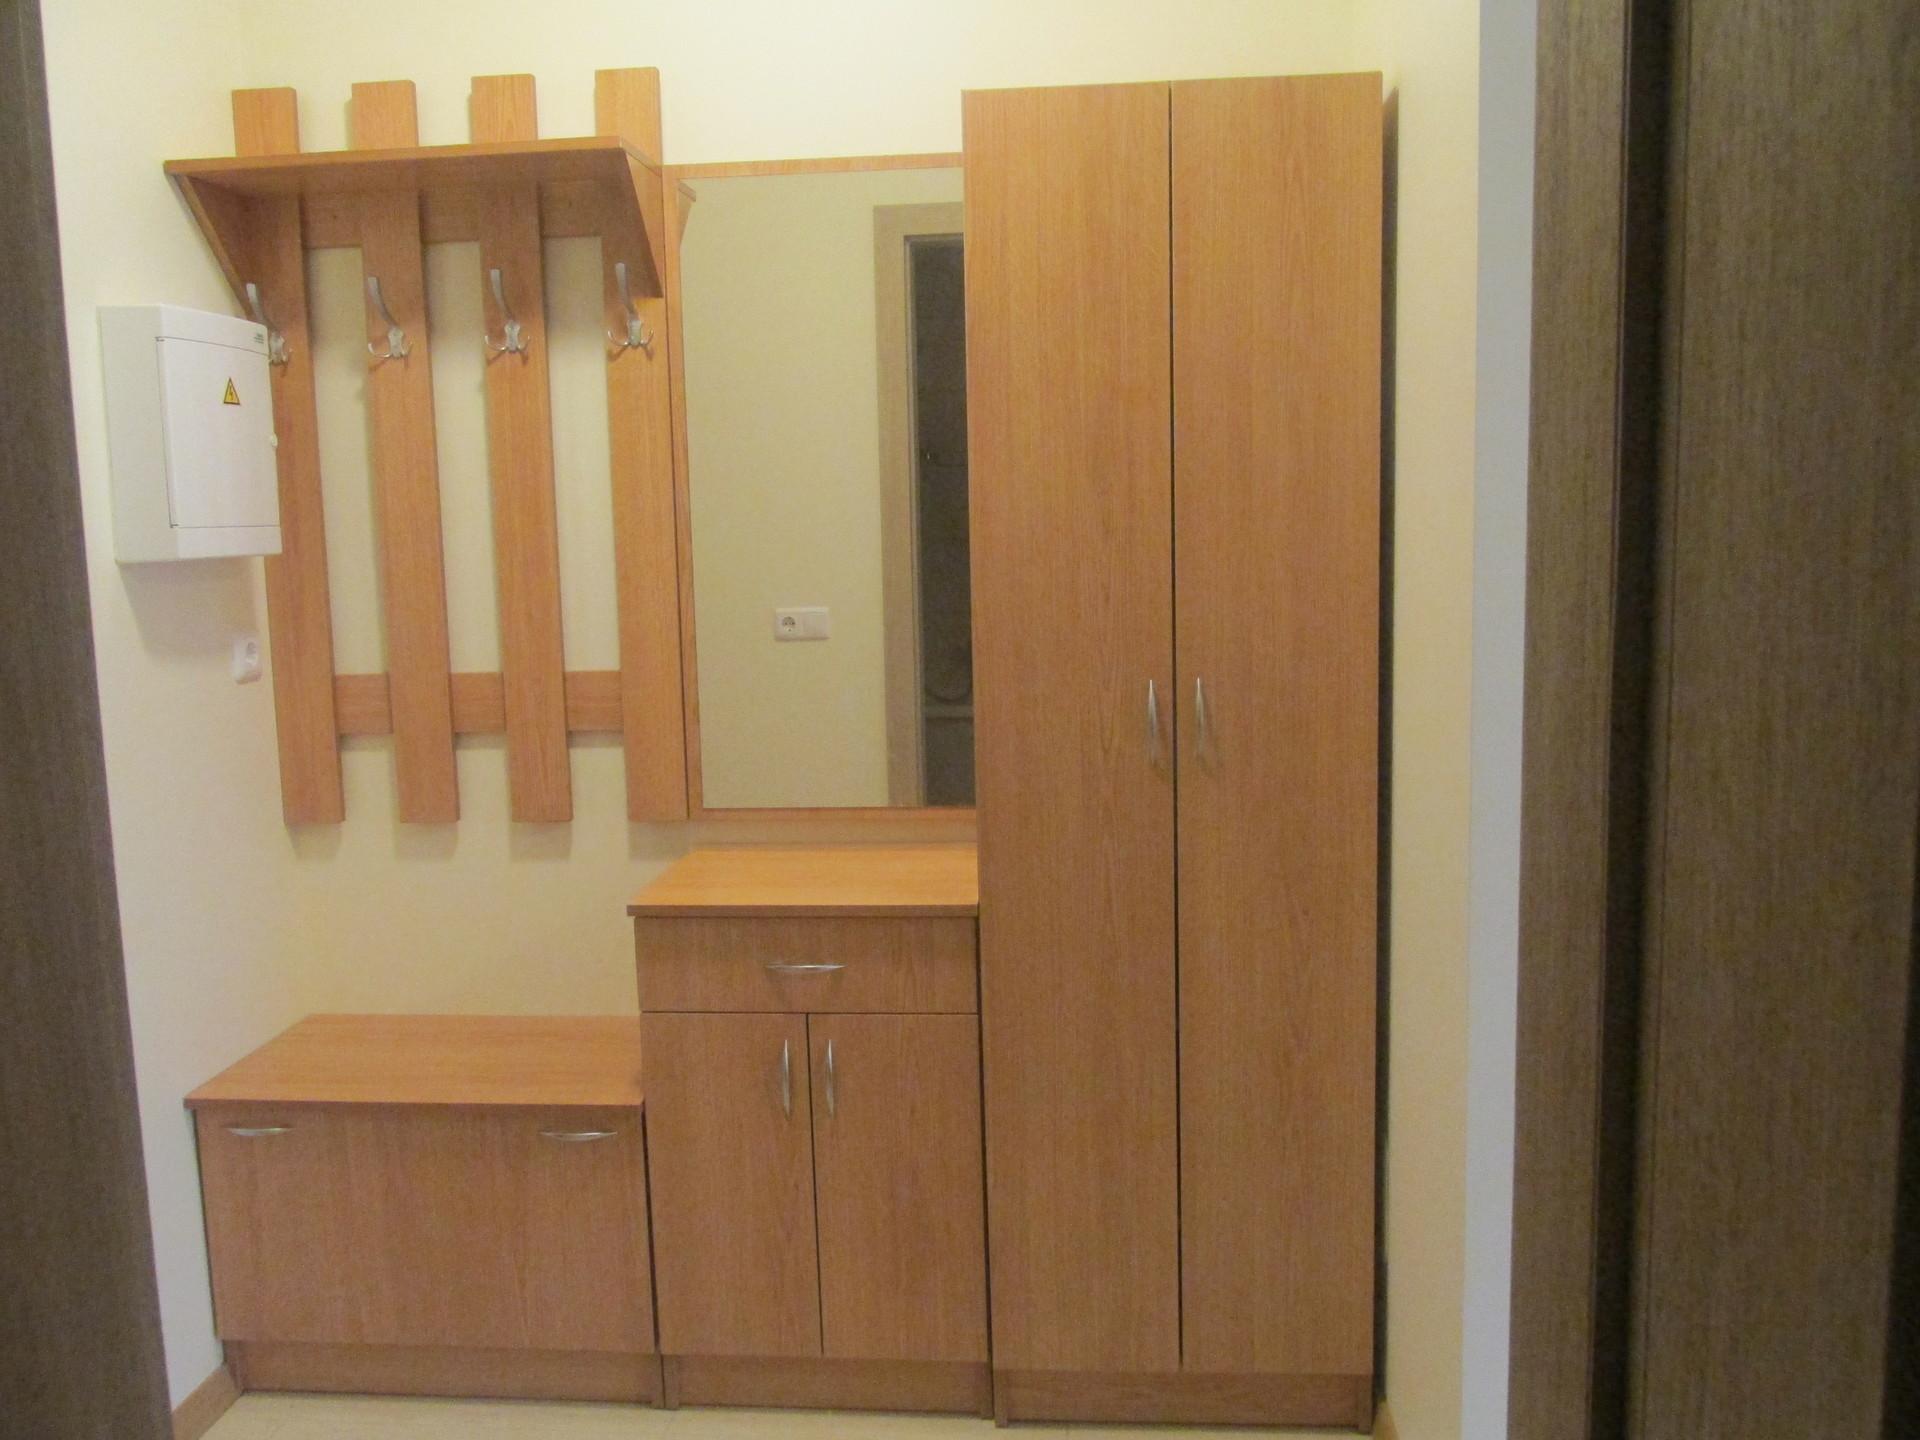 two-bedroom-appartament-48b0b74f3044843b71d3260fef40d6ac